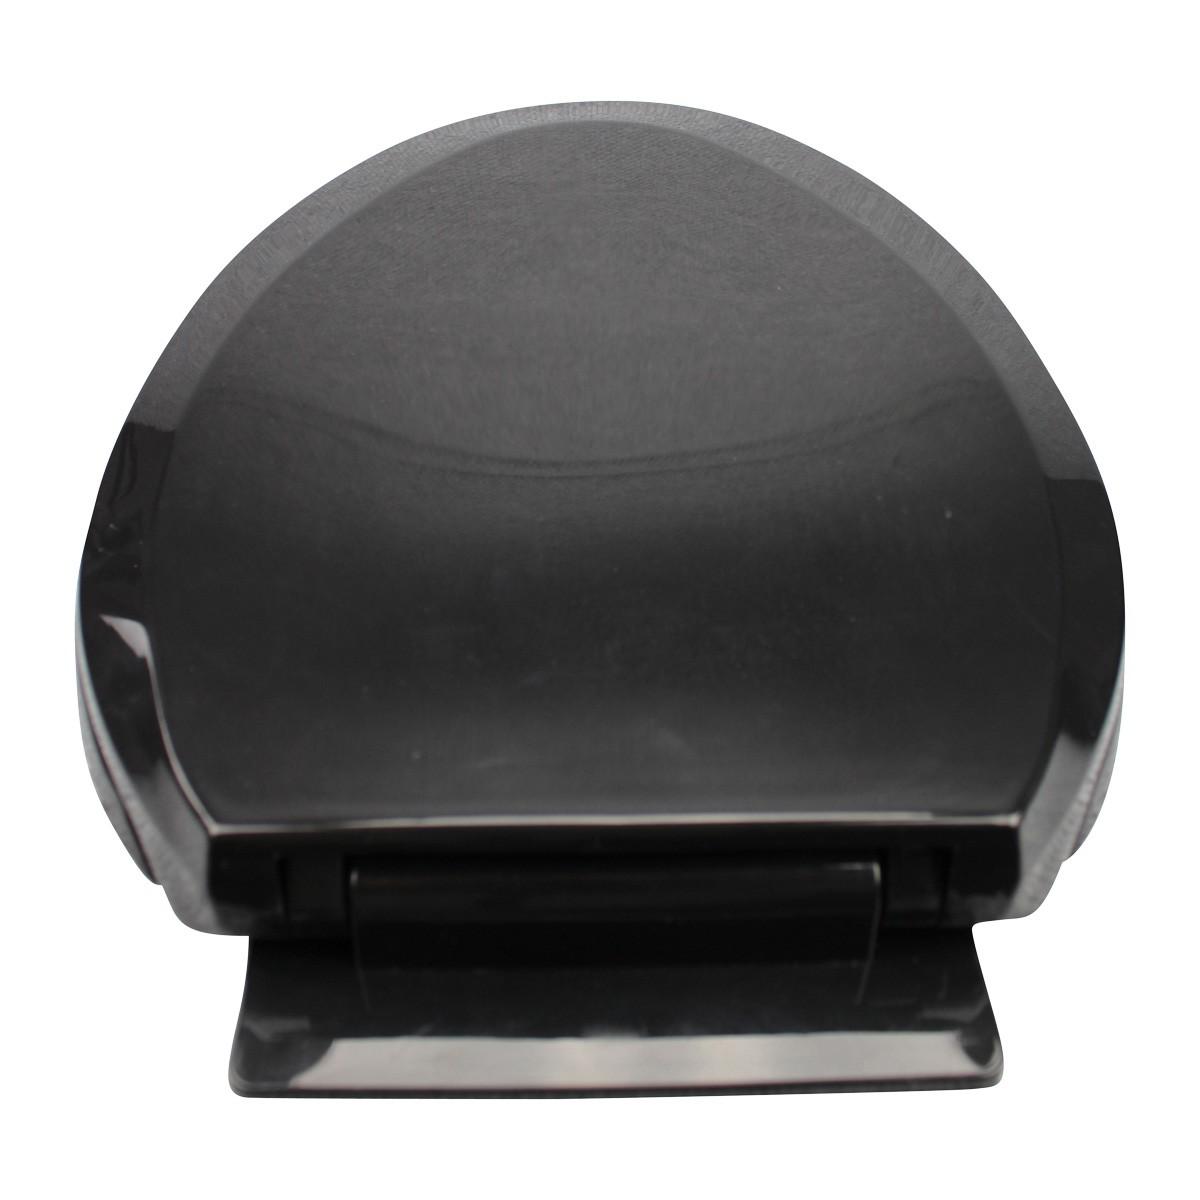 No Slam Slow Close Plastic Elongated Toilet Seat in Black Renovators Supply Slow Soft Close Closing No Slam Heavy Duty Modern Black Elongated Toilet Seat